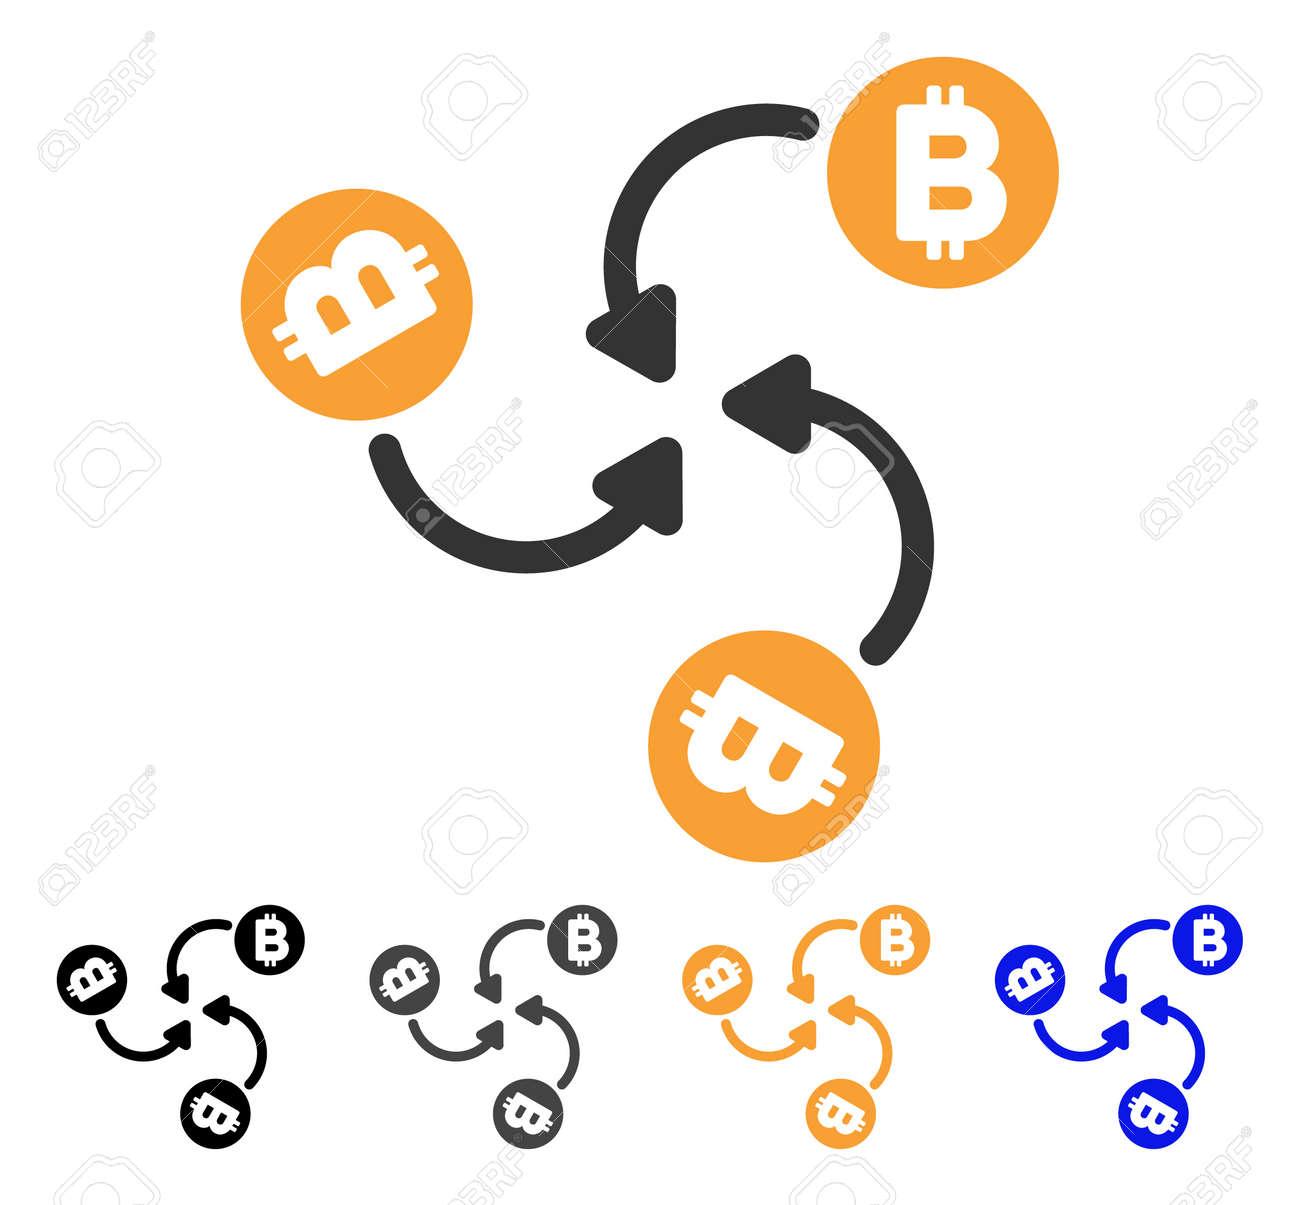 Appliance money laundering stock photos royalty free business images vector illustration style is flat iconic symbol with black gray buycottarizona Images